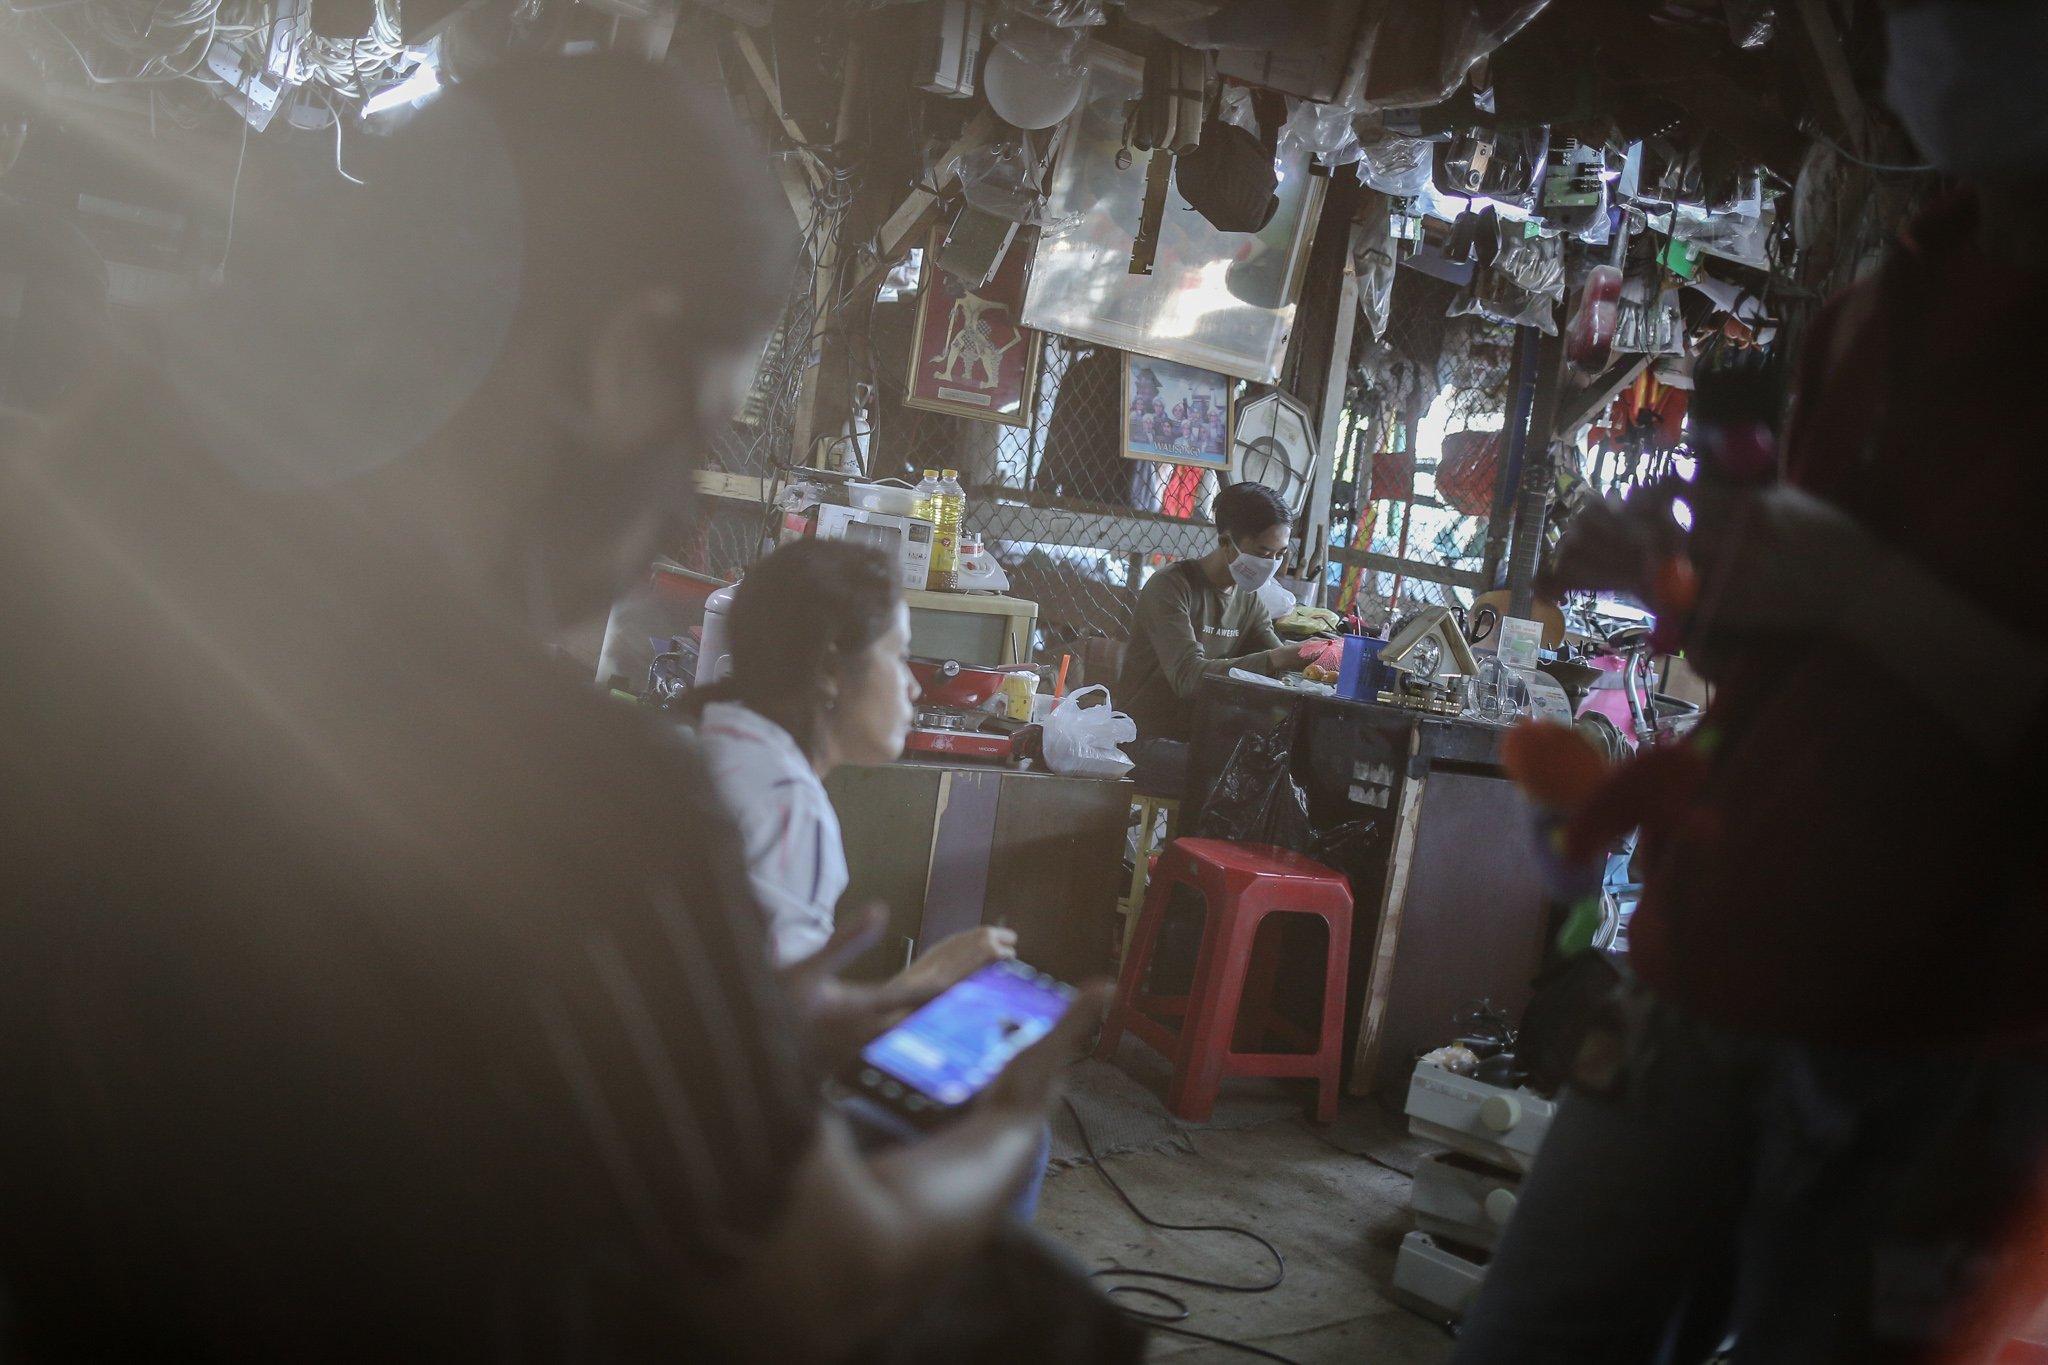 Pengunjung melakukan pembayaran menggunakan menggunakan Quick Response Indonesia Standard (QRIS) di Mal Rongsok Beji, Depok, Jawa Barat, Jumat, (17/9/2021). Selama masa pandemi Covid-19, sekitar 82,9% pelaku UMKM alami penurunan omzet. pemilik Mal Rongsok itu juga mengaku demikian.